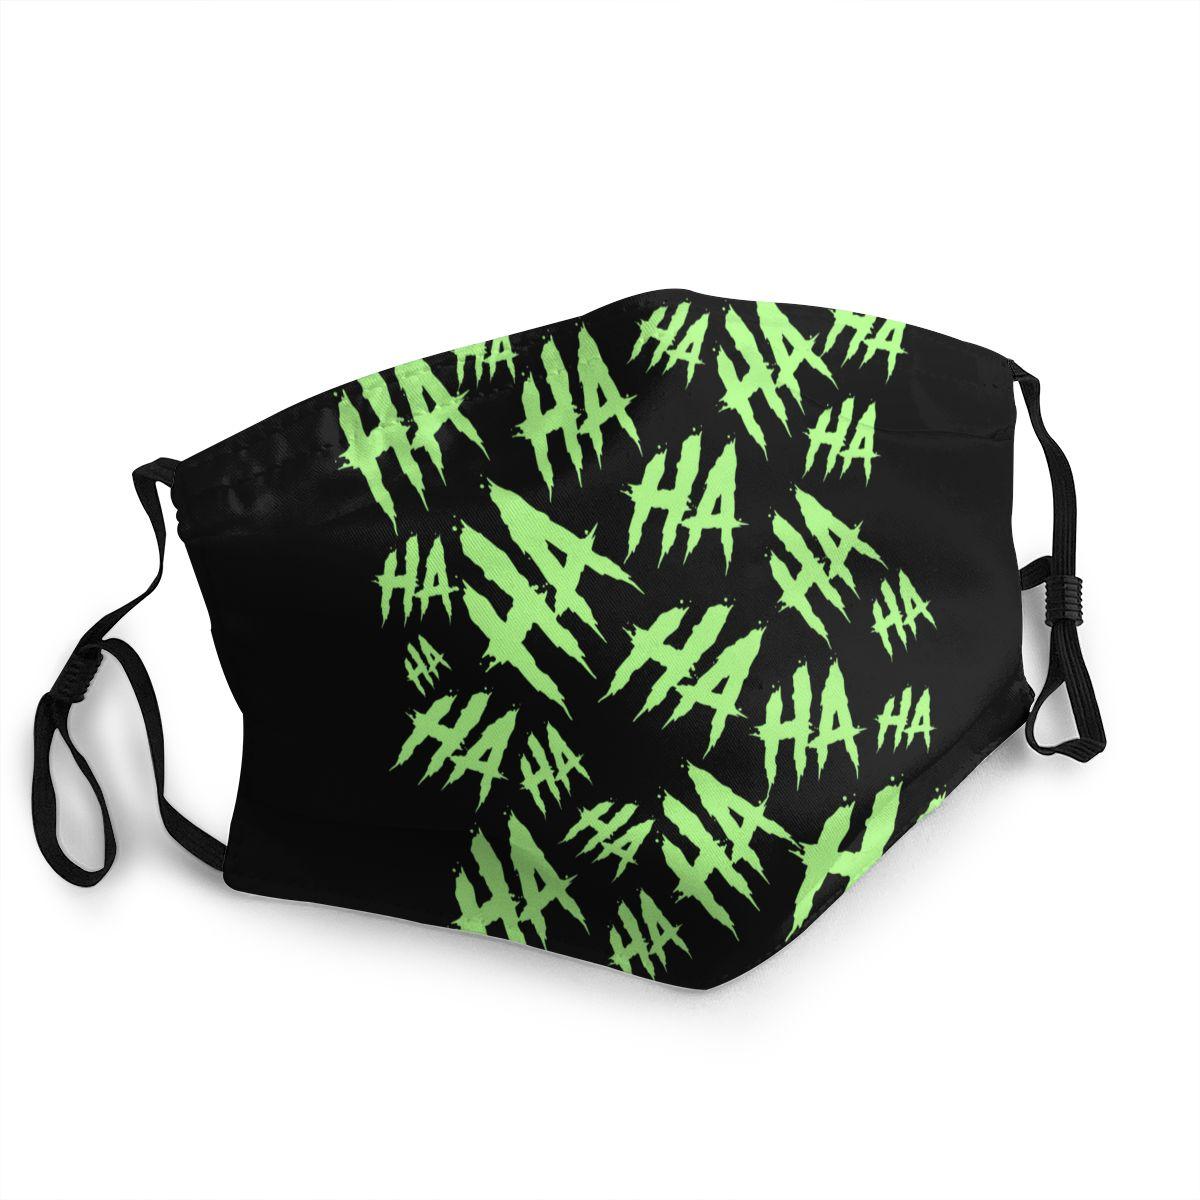 Acid Laugh Non-Disposable Face Mask Joker Gotham Anti Haze Dustproof Mask Protection Cover Respirator Mouth Muffle